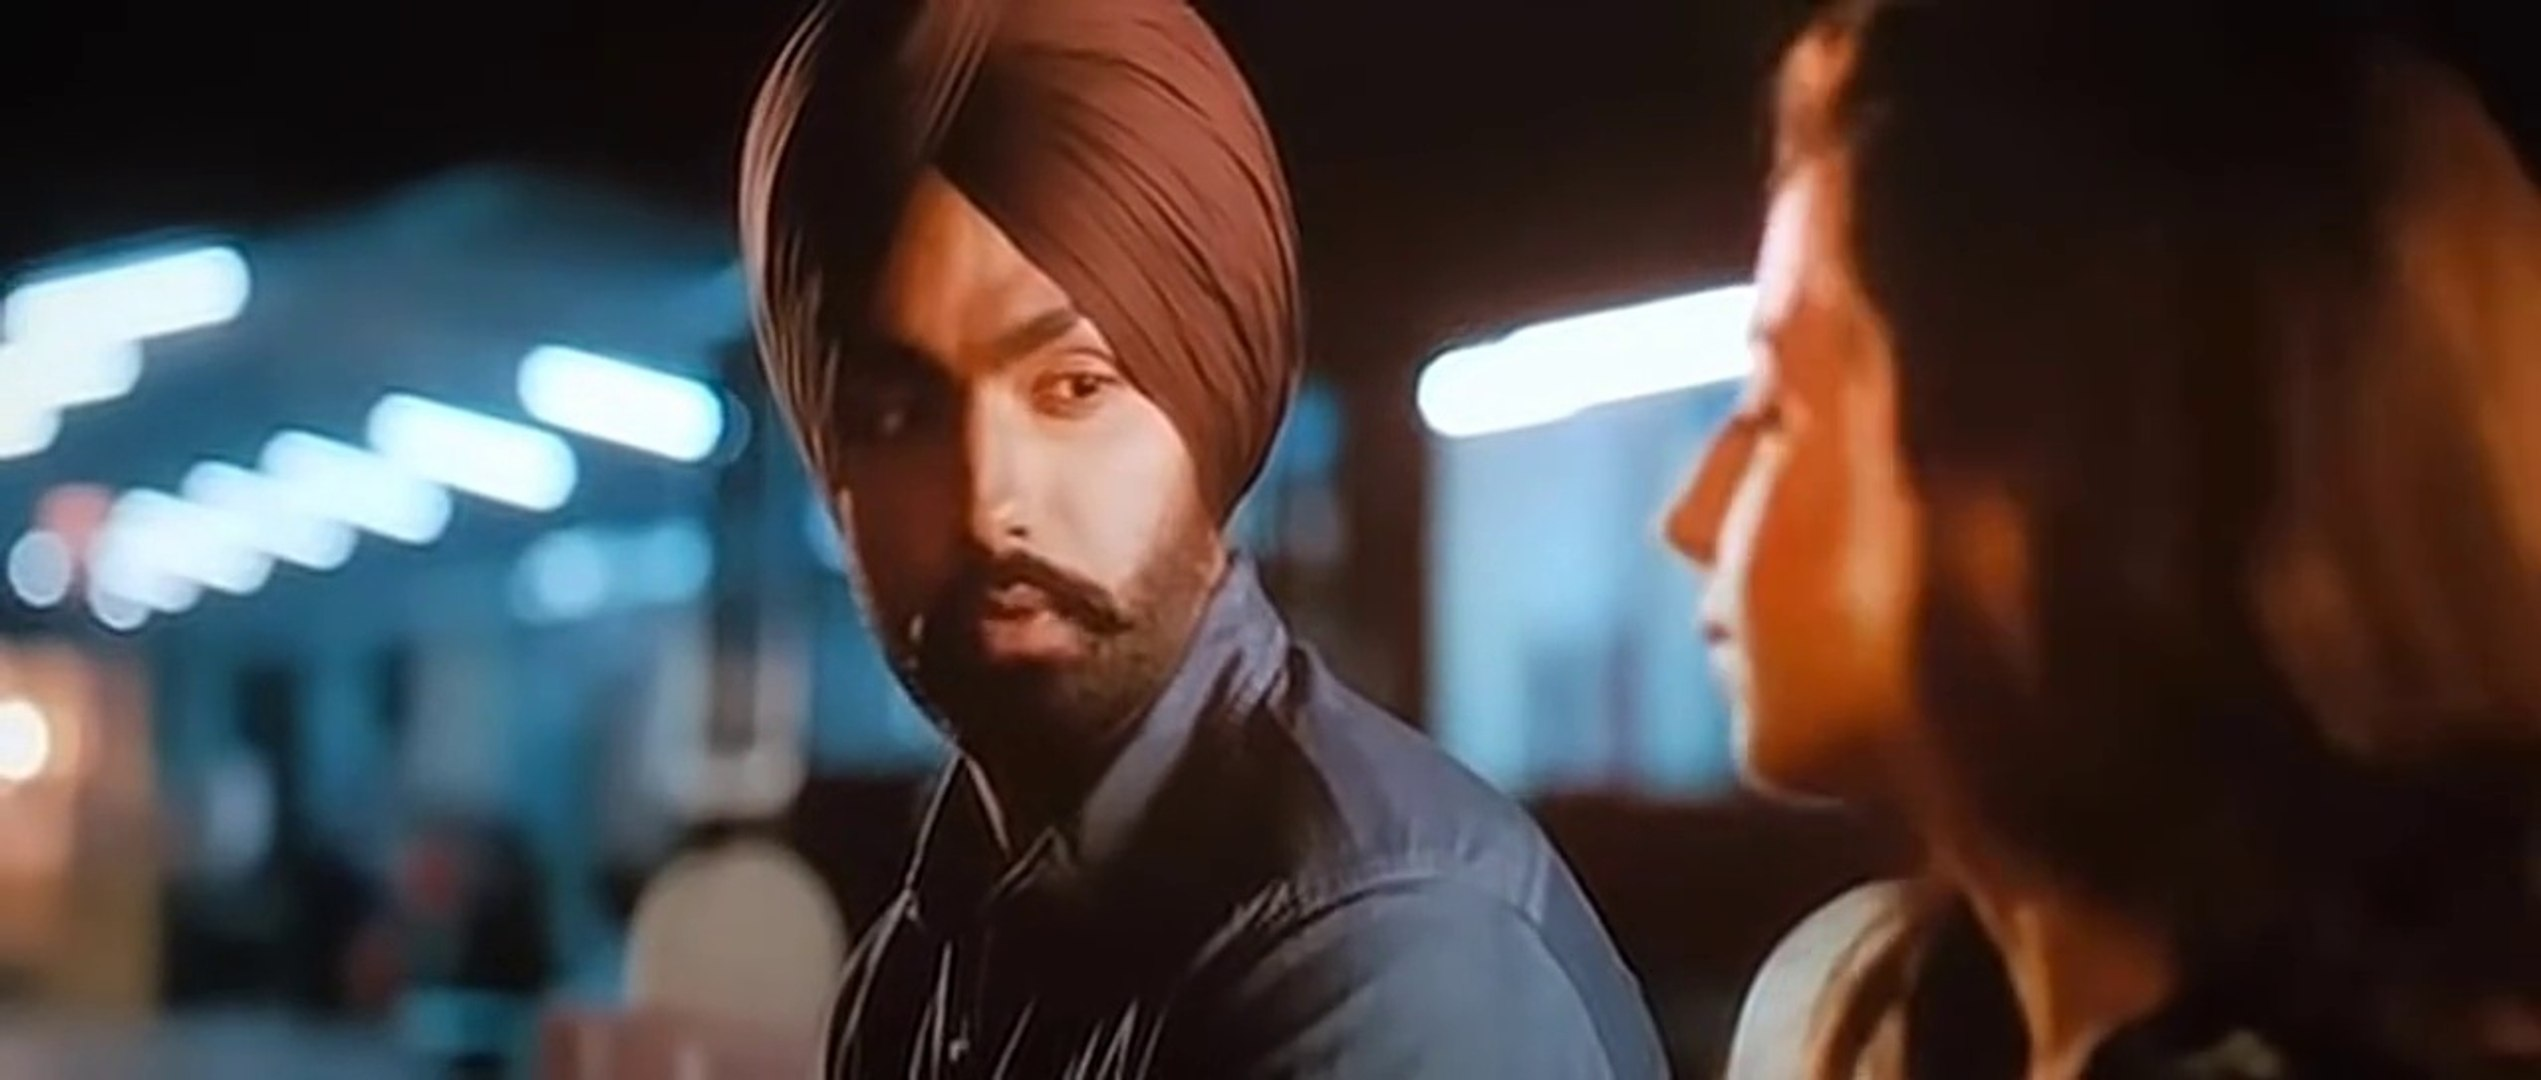 Qismat 2018 Punjabi Movie By Ammi Virk And Sargun Mehta Part 2